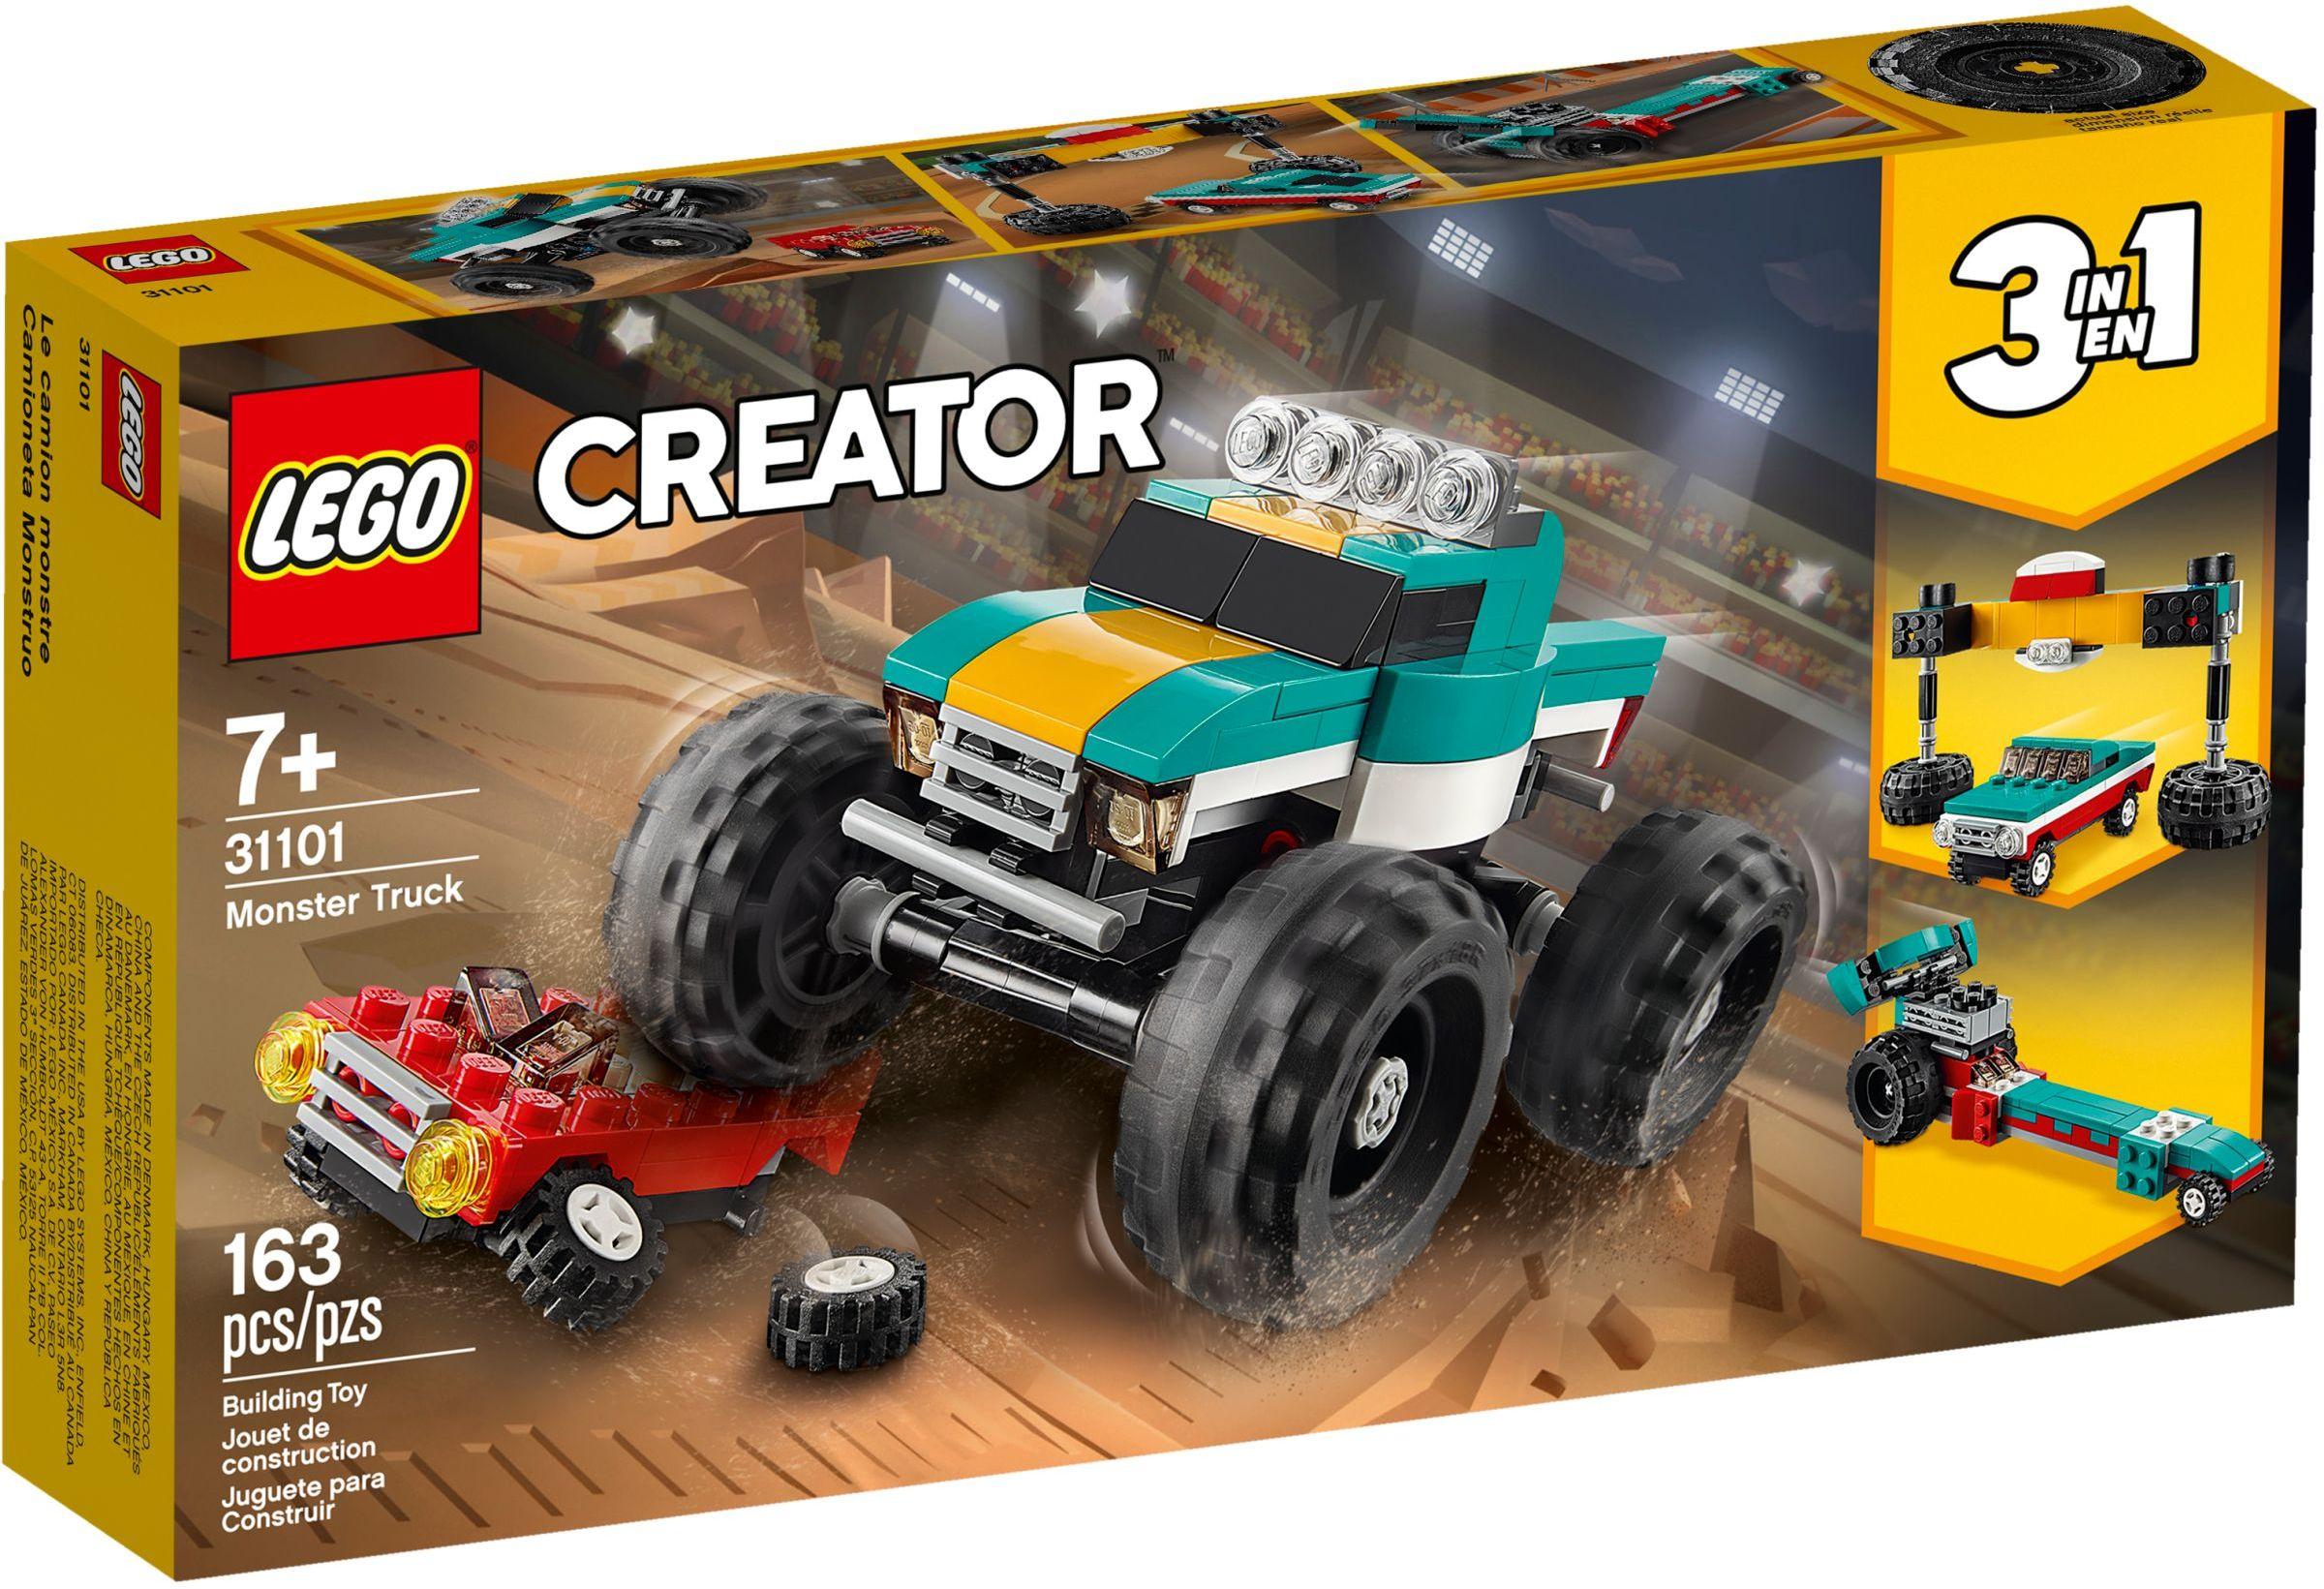 LEGO Creator - Monster Truck (31101)